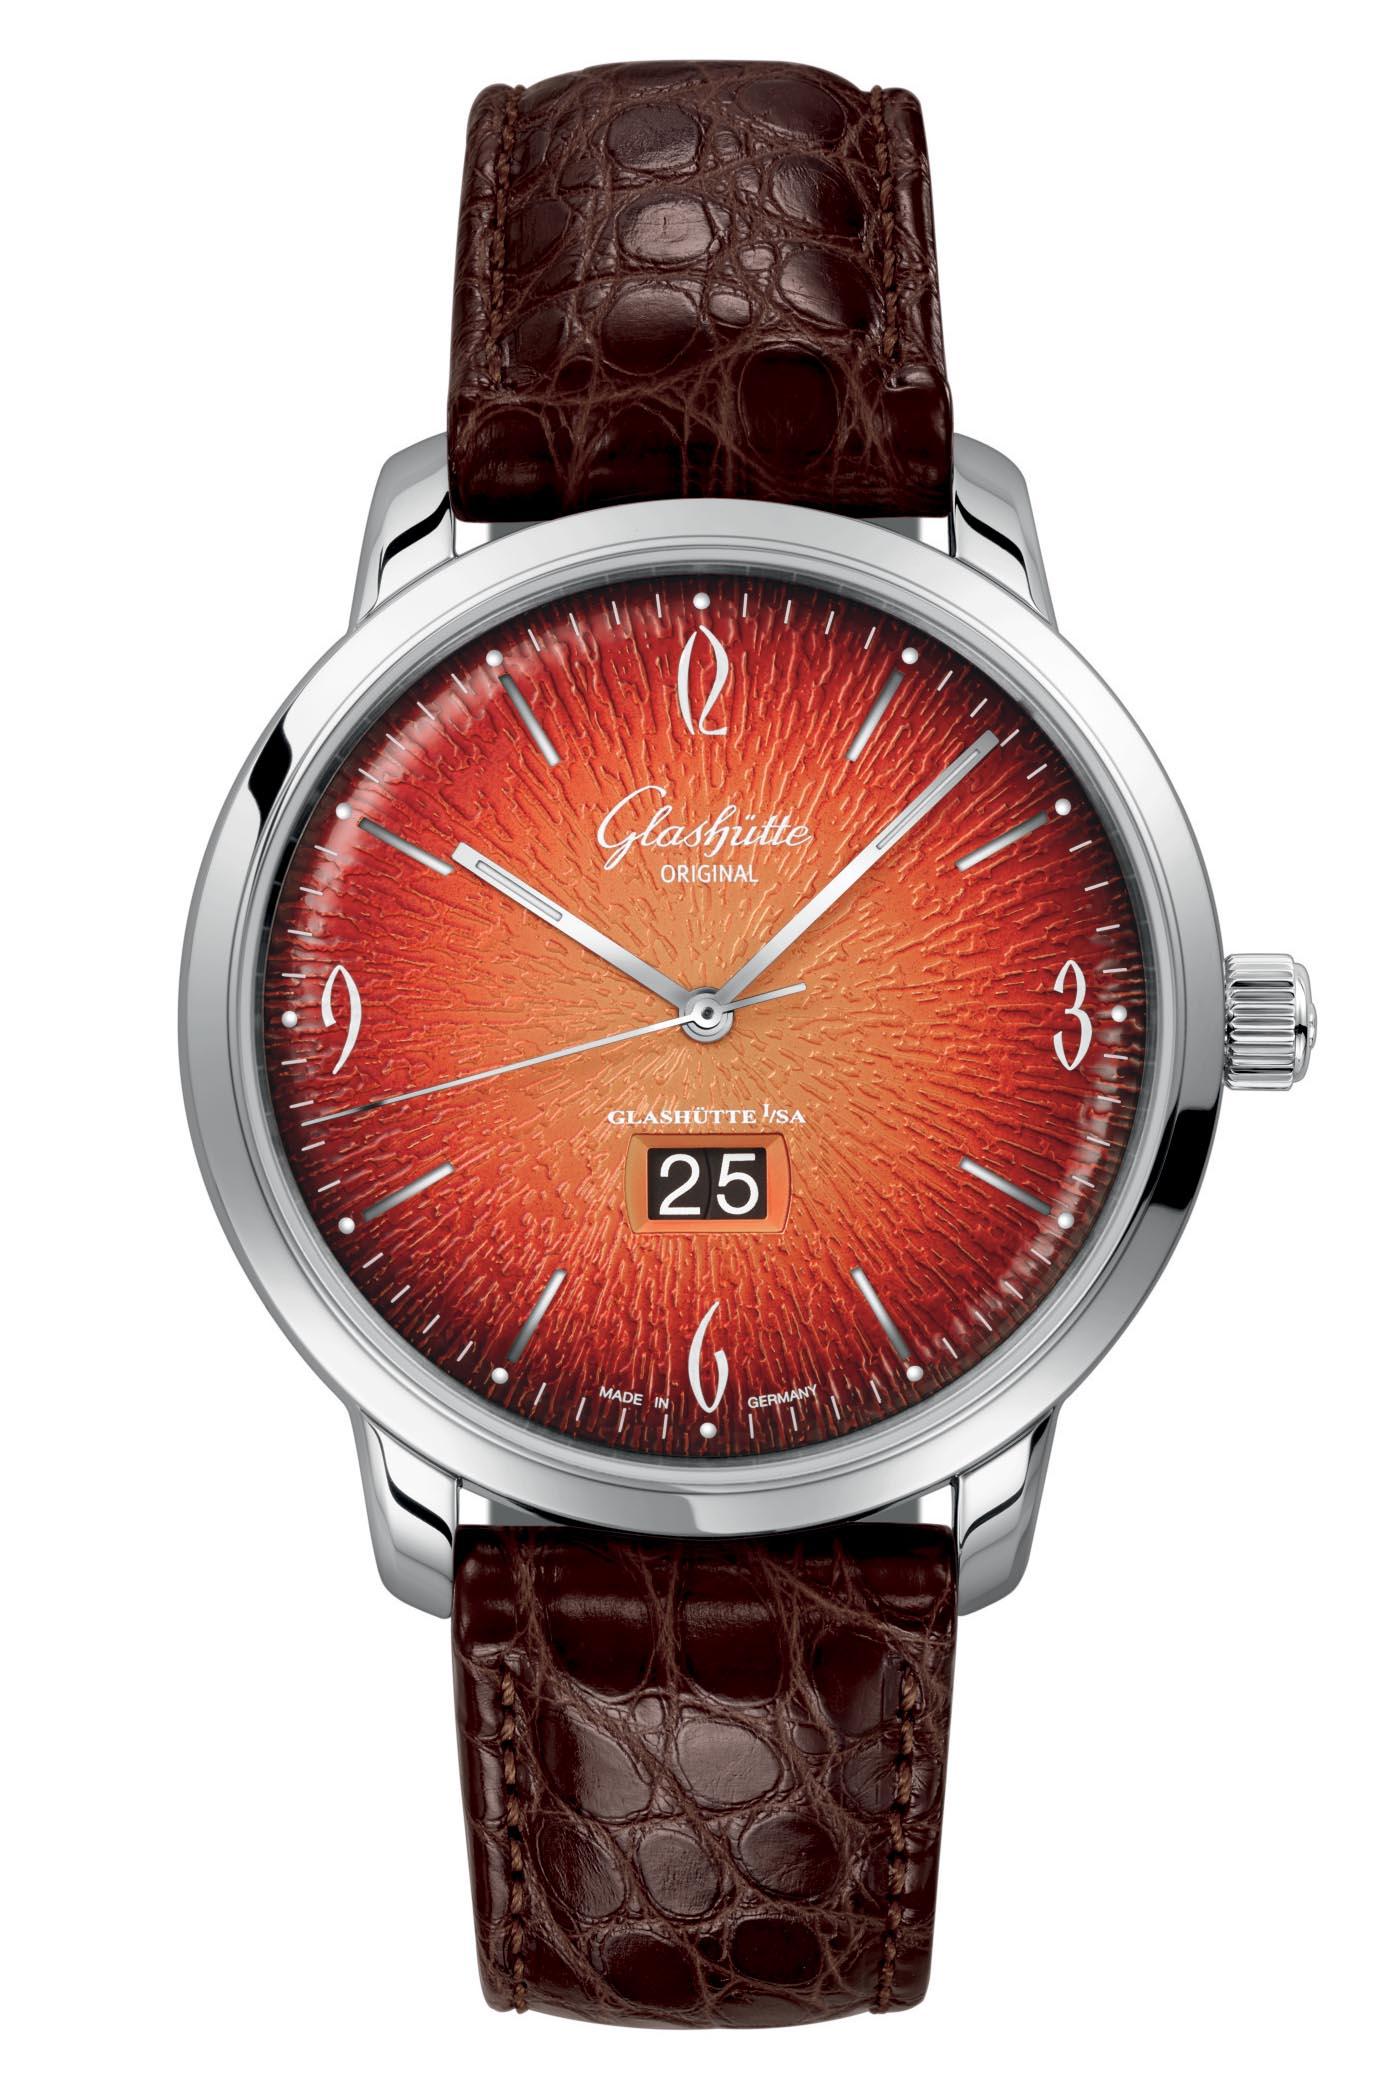 Glashutte Original Sixties and Sixties Panorama Date Annual Edition Fiery Orange - 6